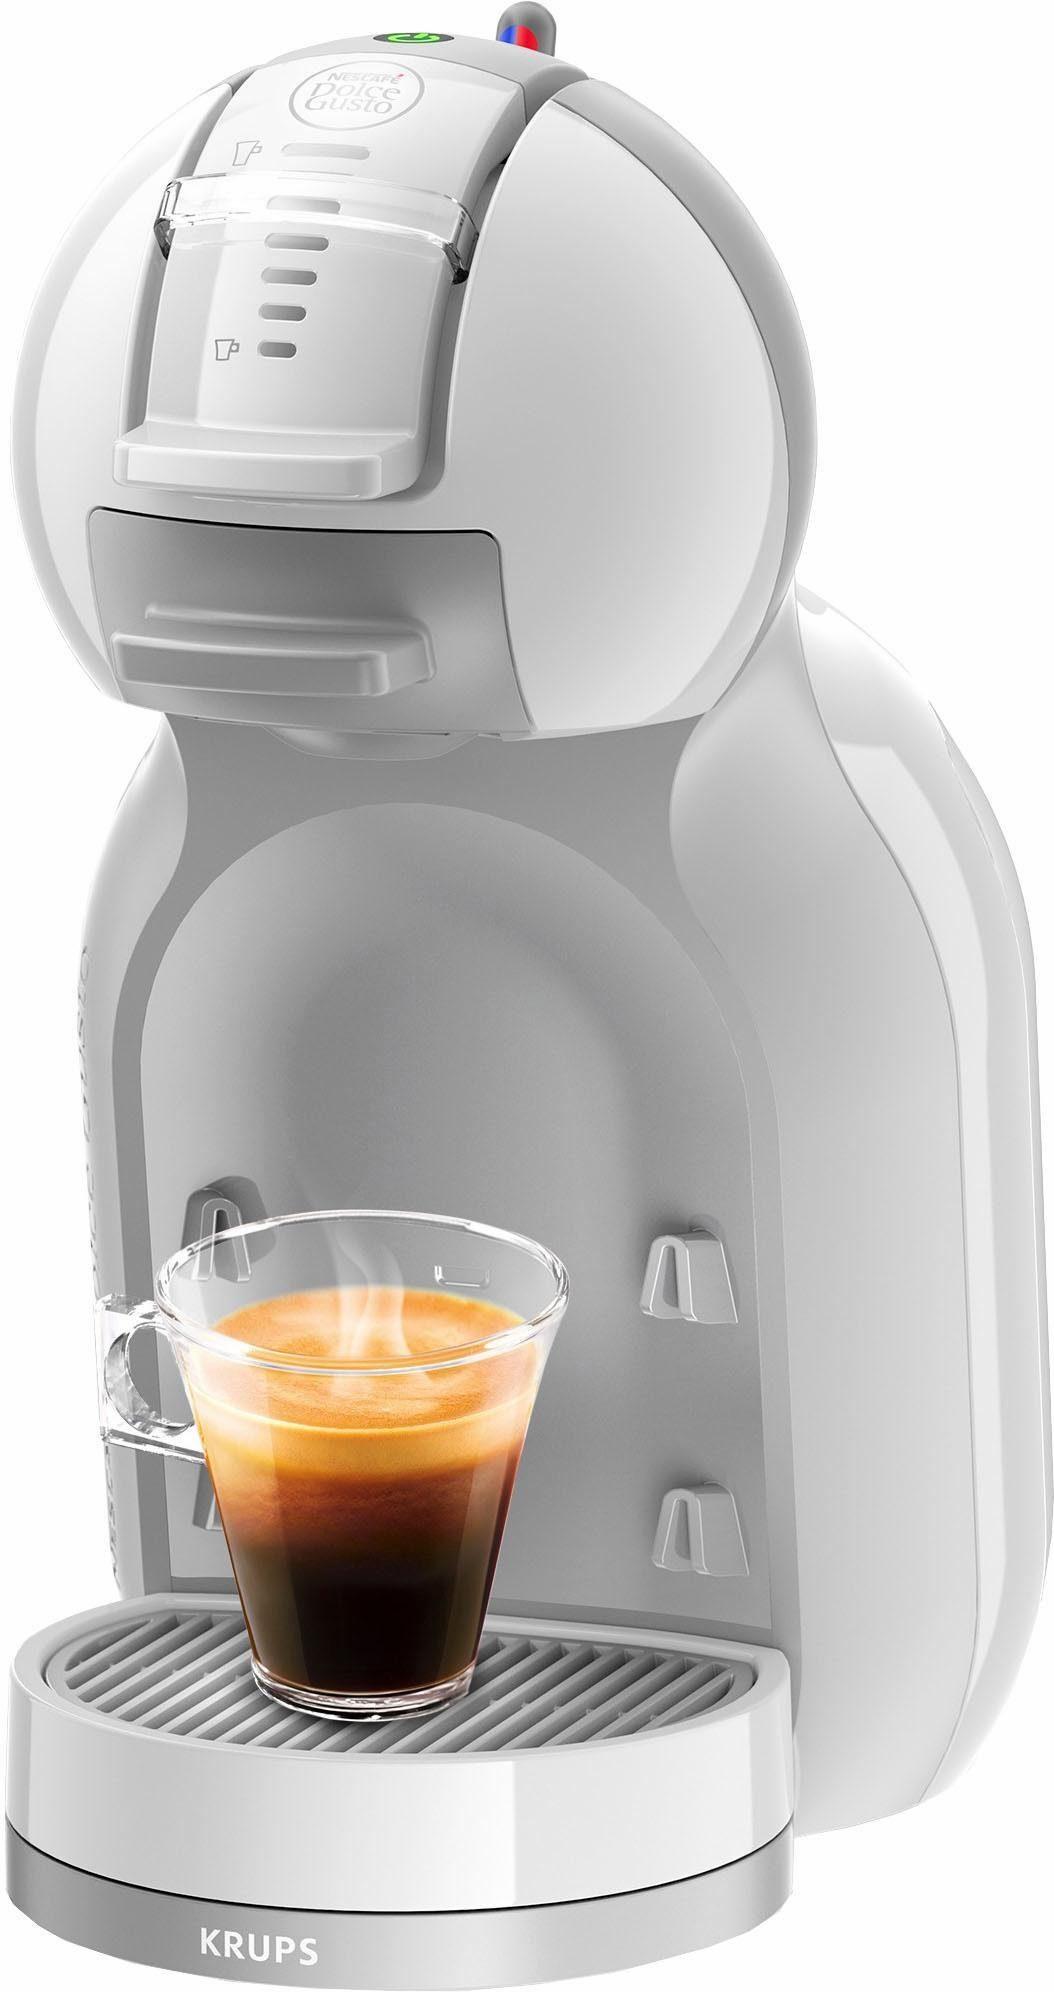 Nescafé Dolce Gusto Kapselmaschine KP1201 Mini Me